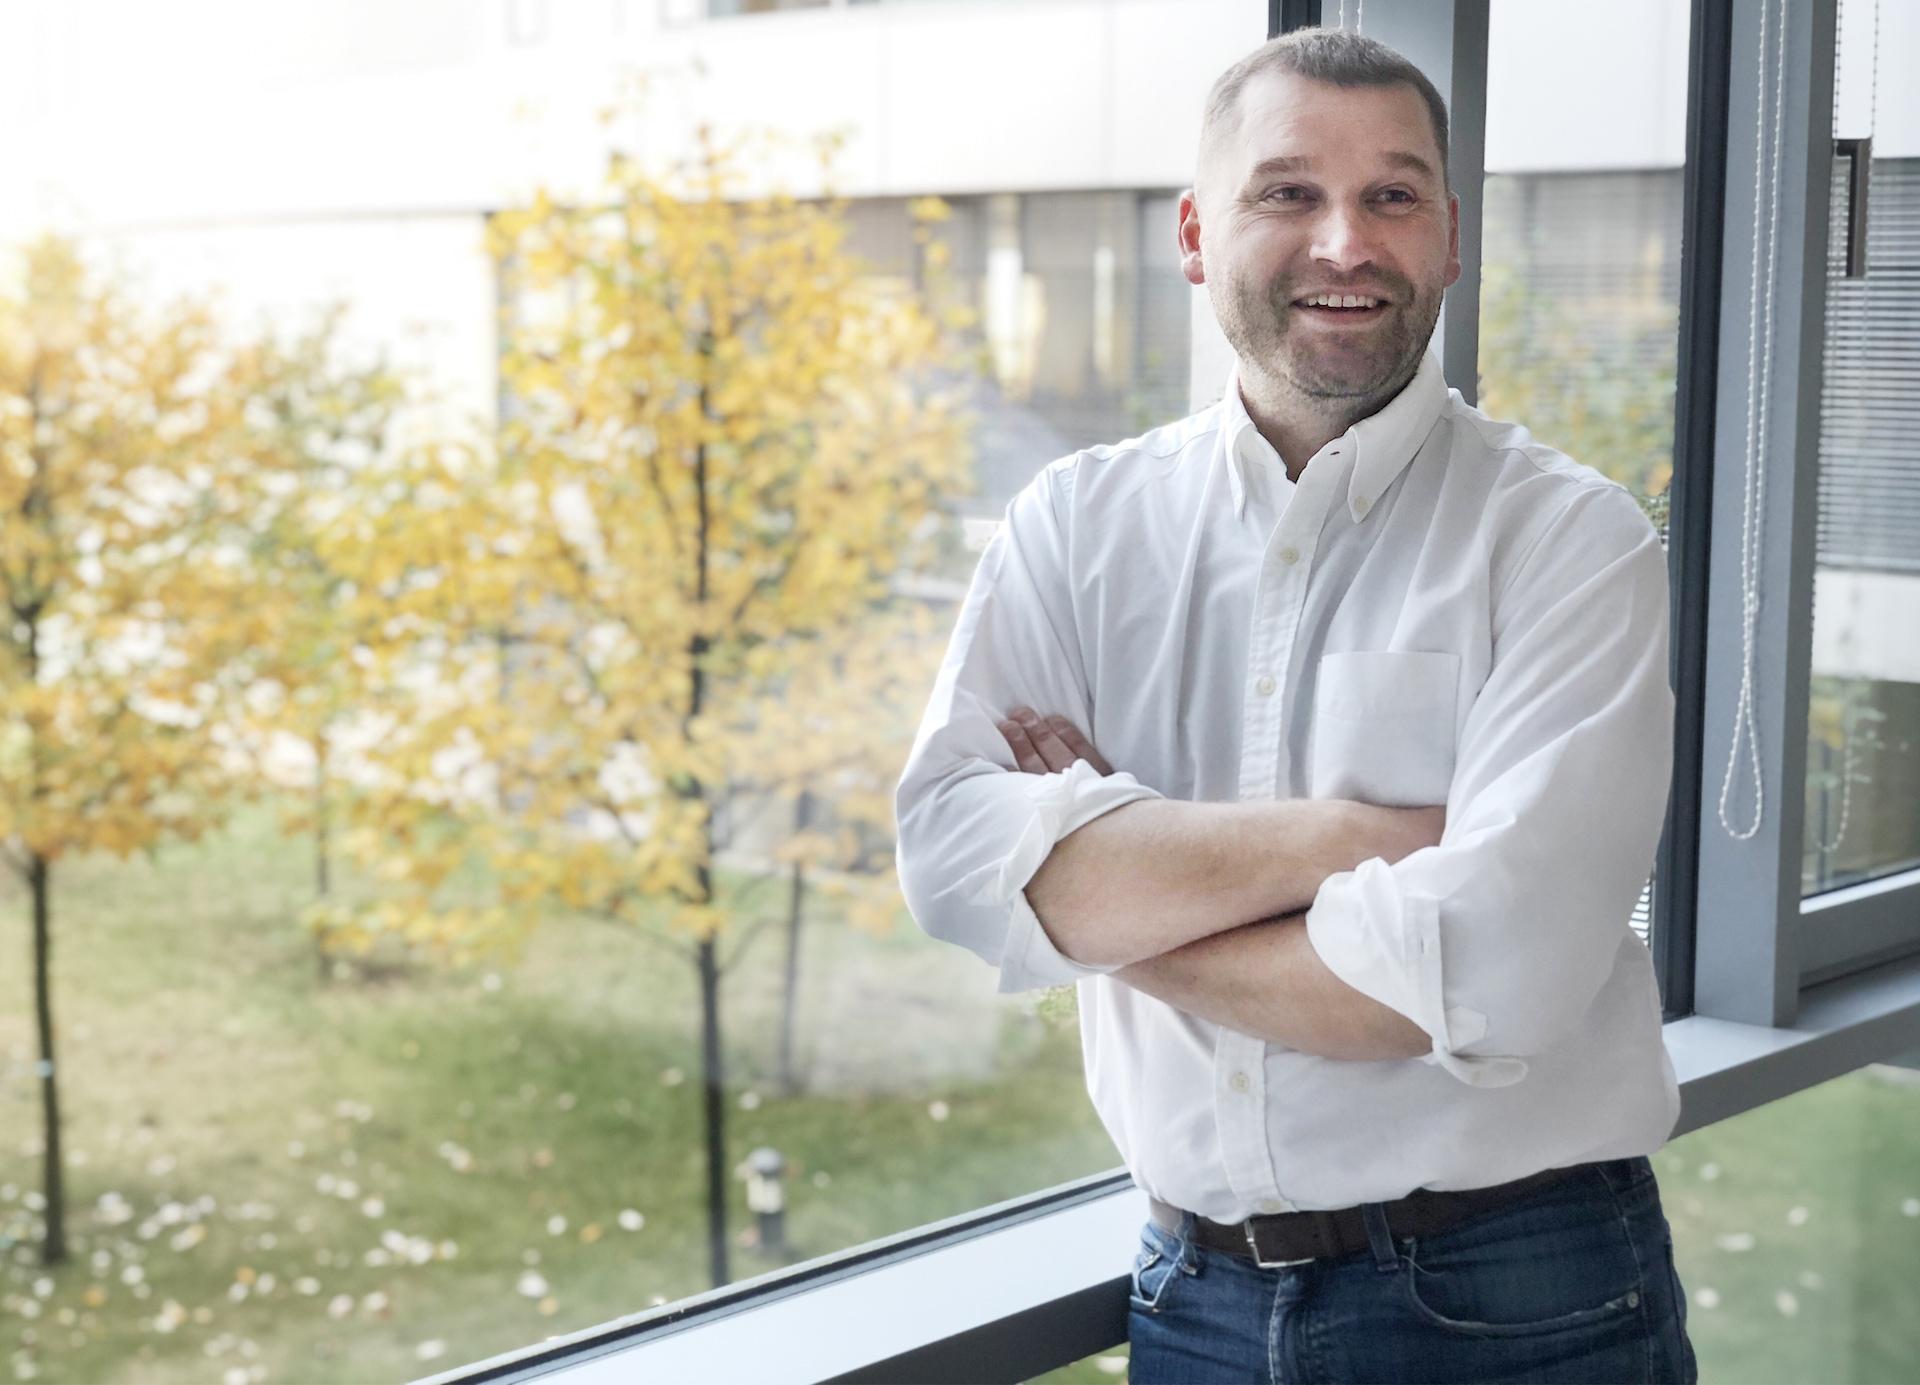 Tomáš Jeřábek, CEO Košík.cz